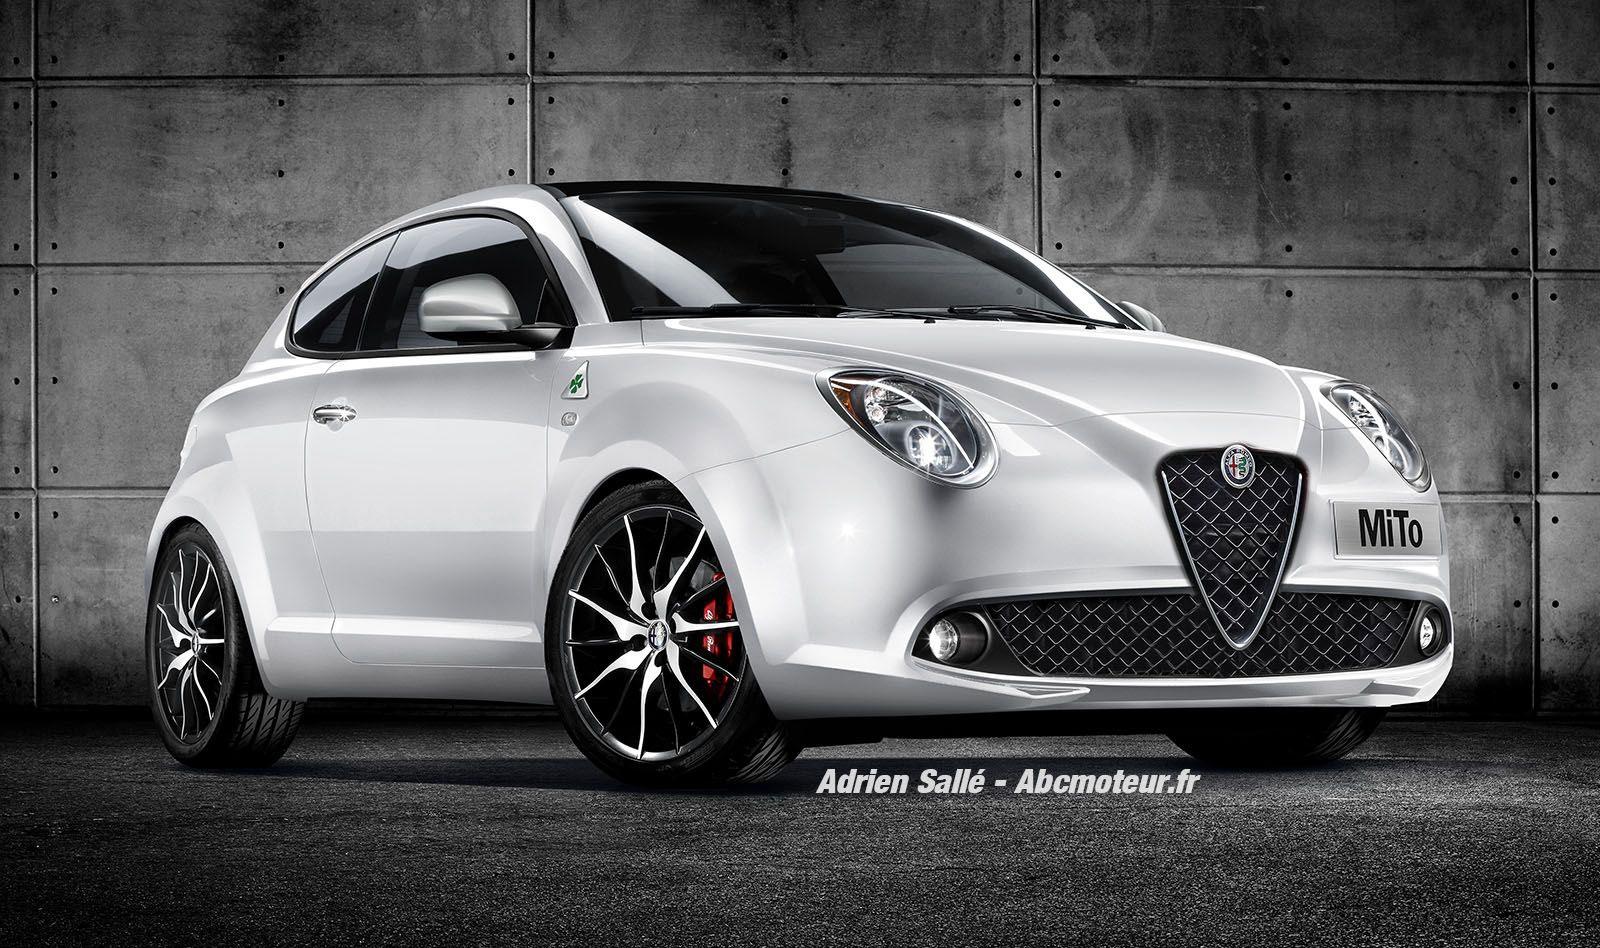 2016 - [Alfa Romeo] MiTo restylée 969713Sanstitre1